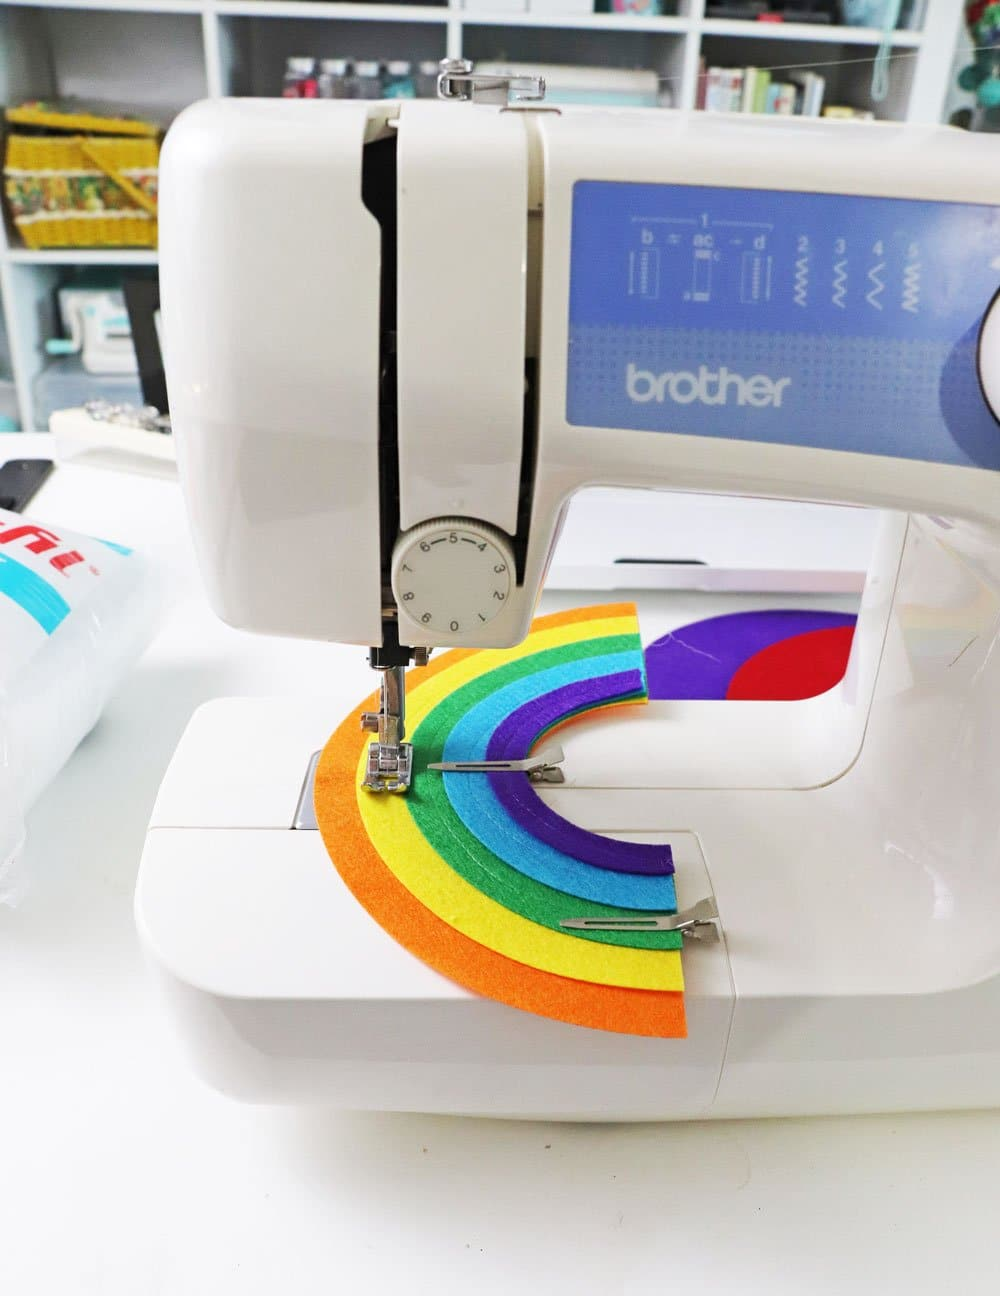 sew together rainbow felt pieces